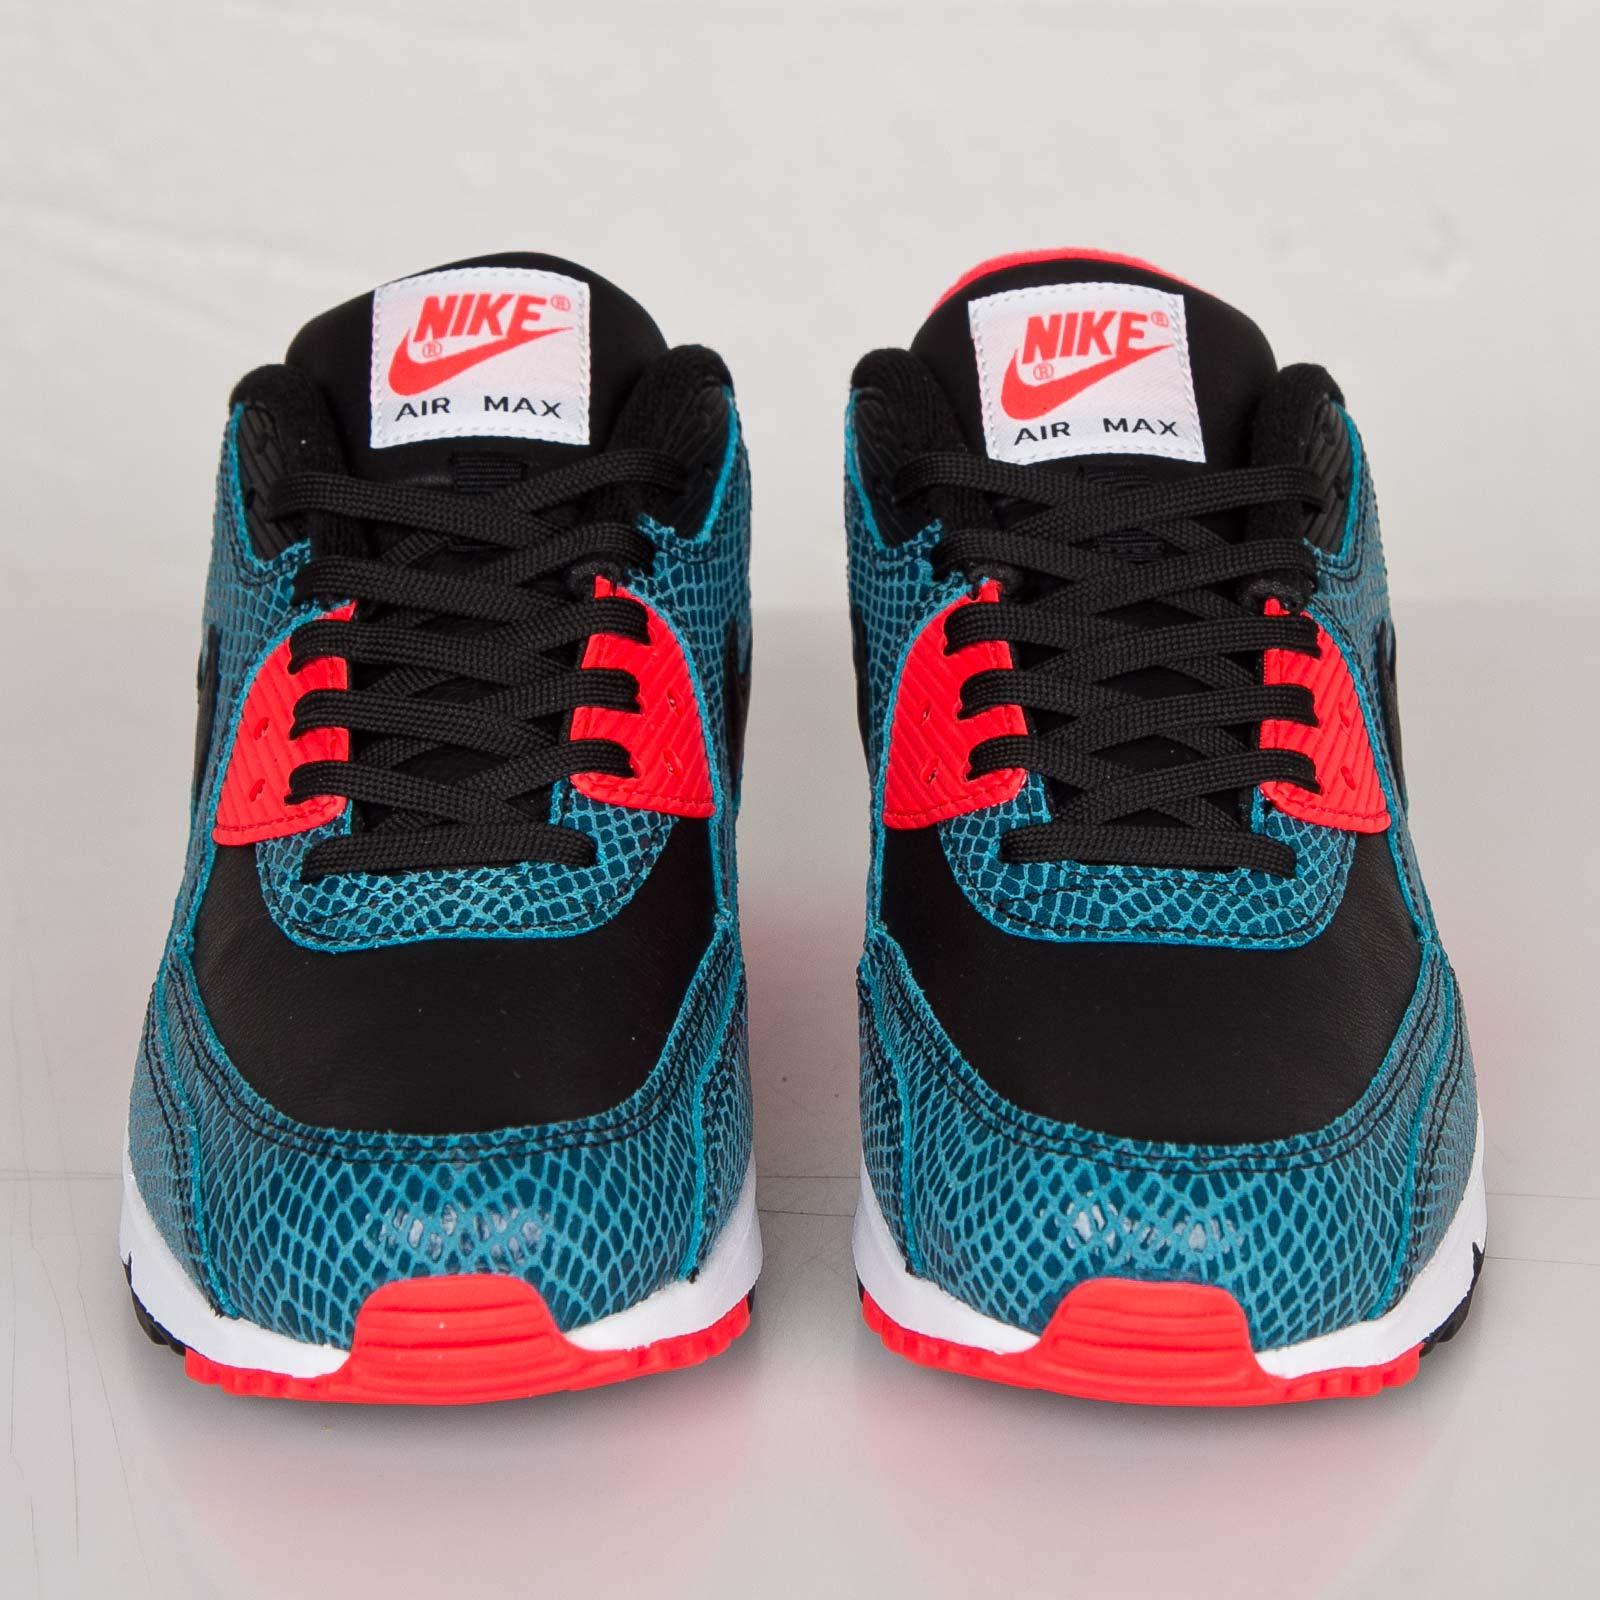 ff1ae23042f Nike Air Max 90 Anniversary - 725235-300 - Sneakersnstuff | sneakers ...